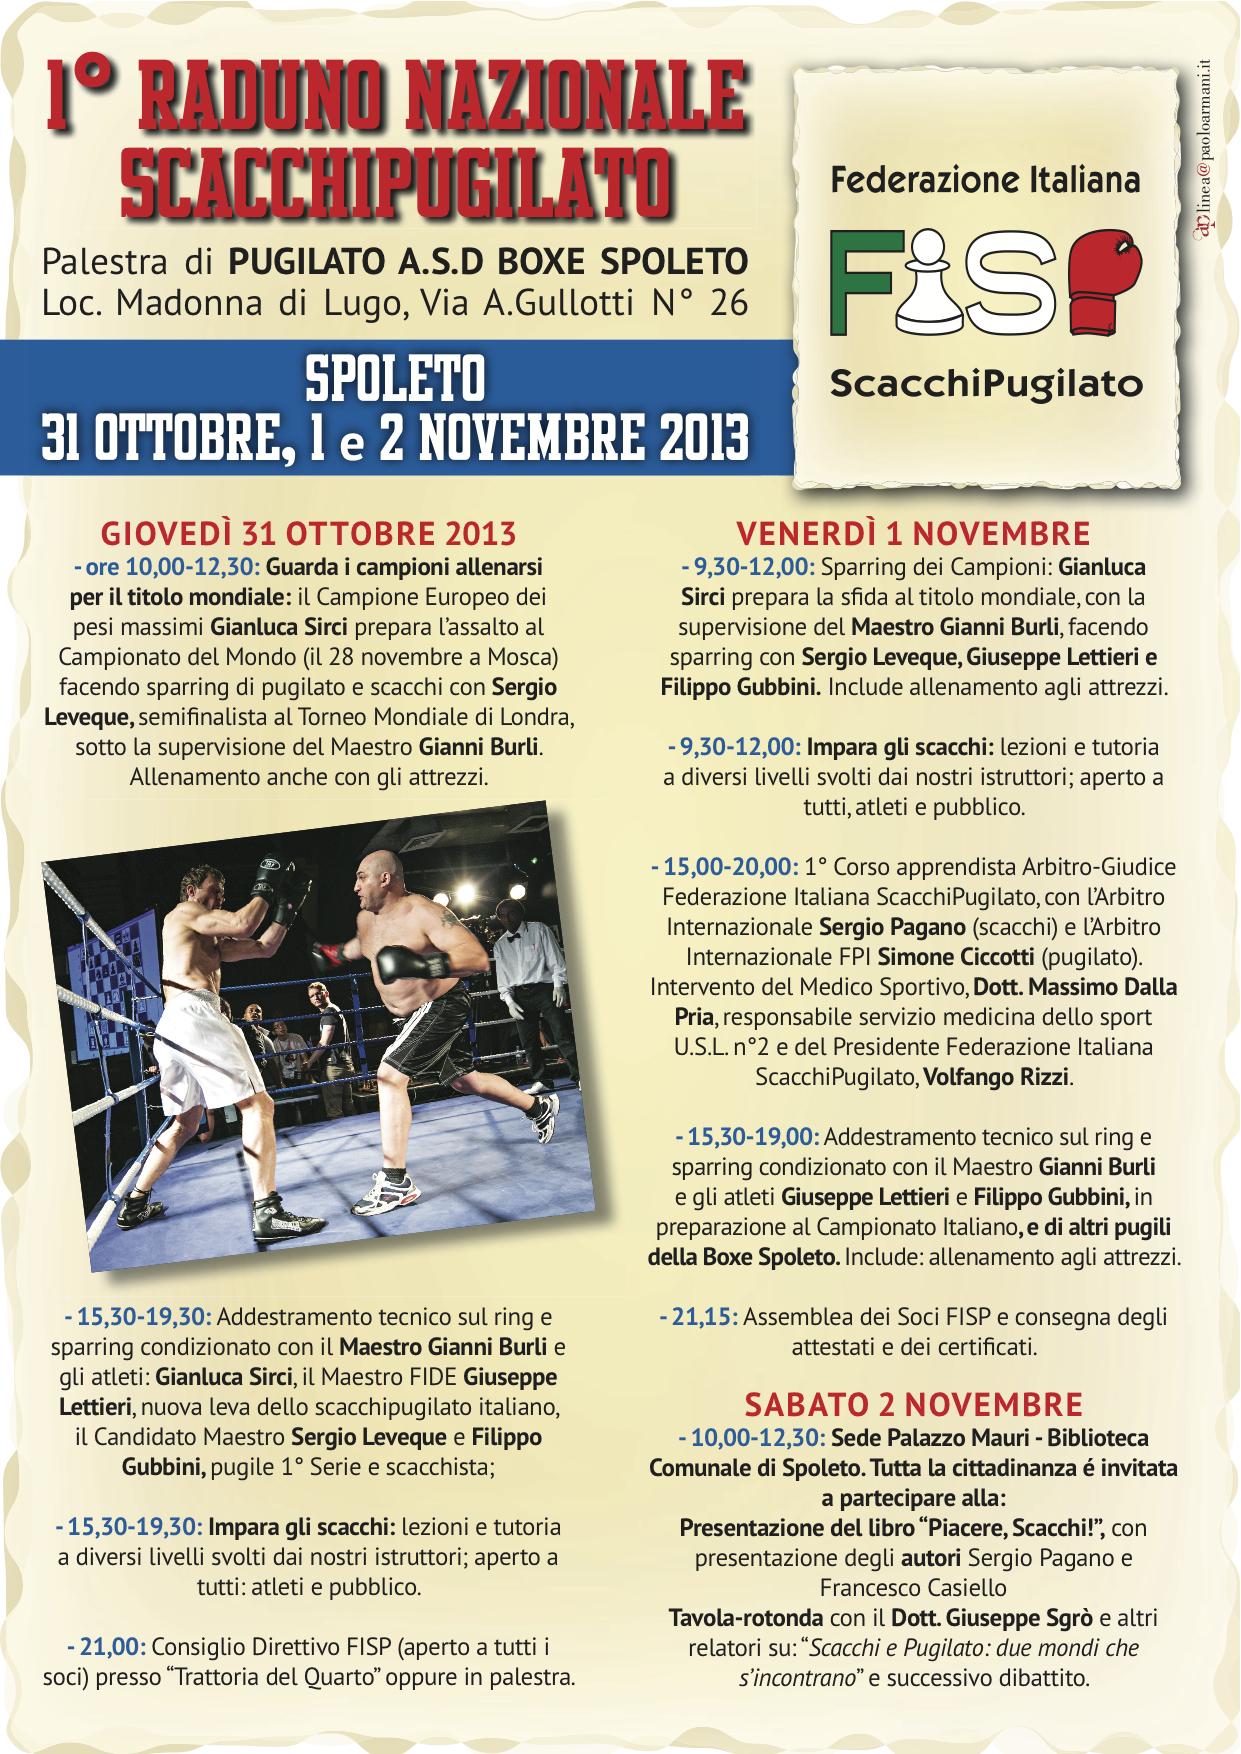 Programma ufficiale del 1º  Raduno FISP a Spoleto dal 31 ottobre al 2 novembre.